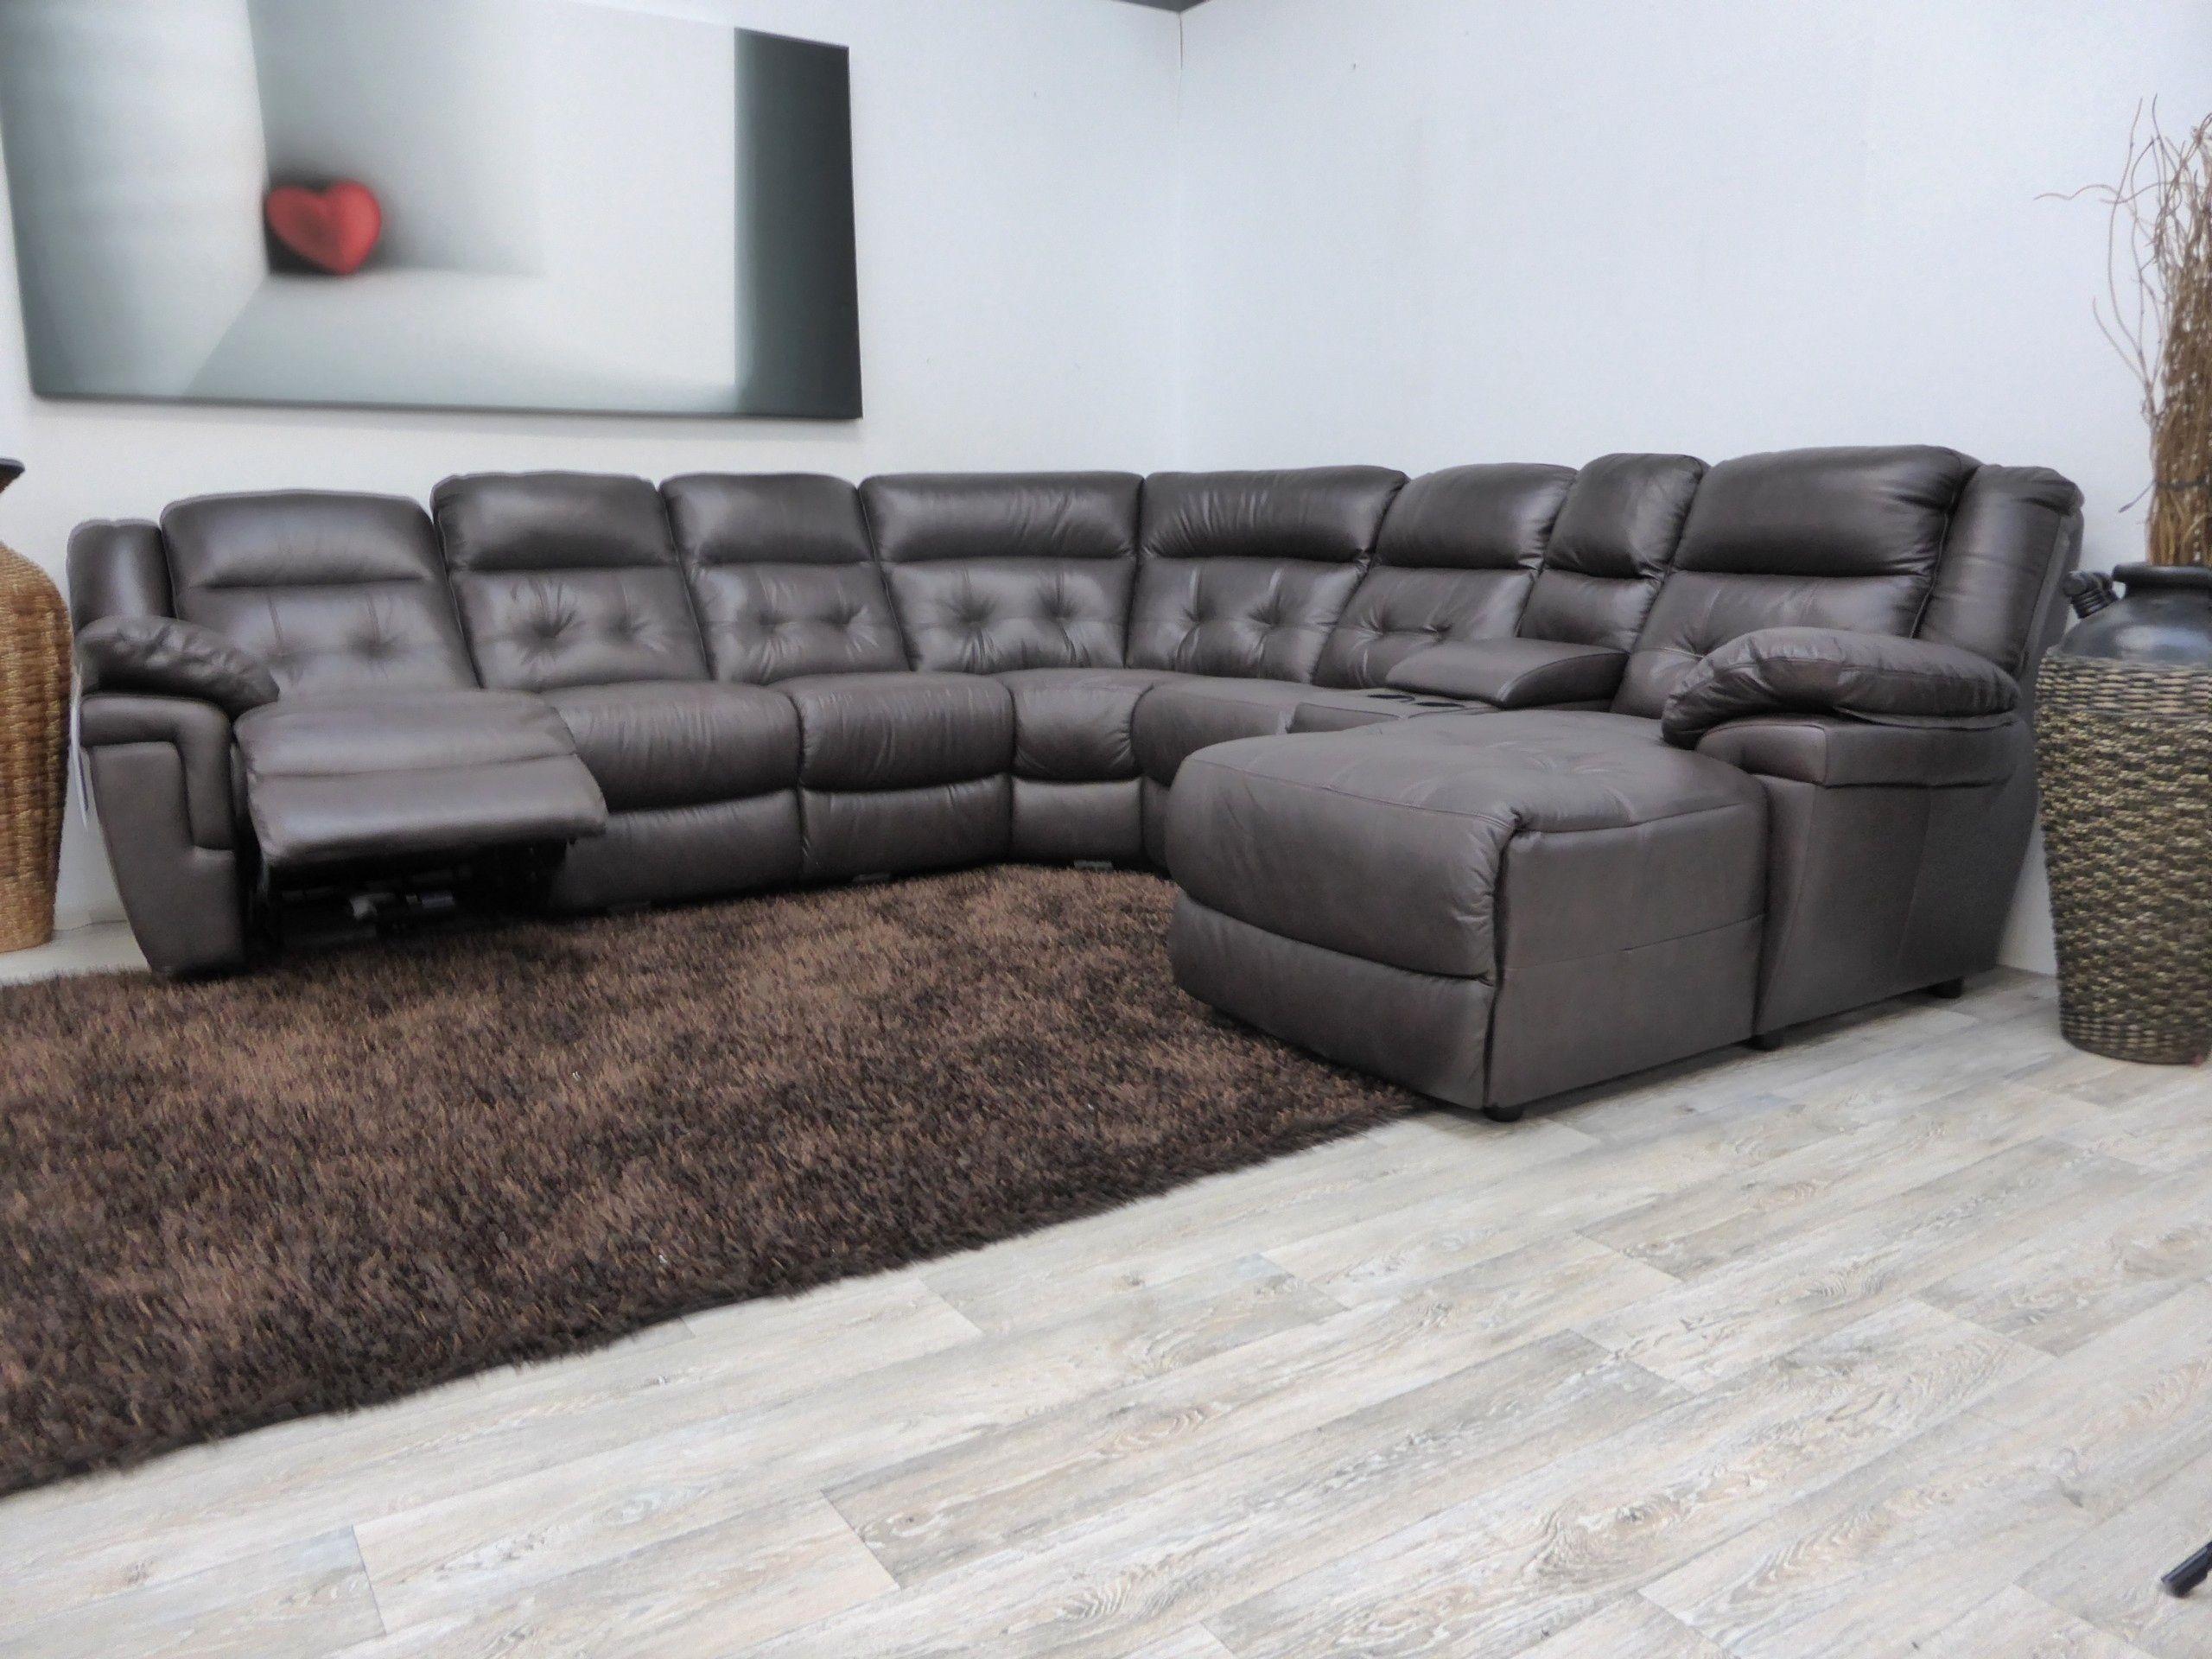 Ski Sleeper Sofa Costco Free Mission Table Plans Westport Taraba Home Review